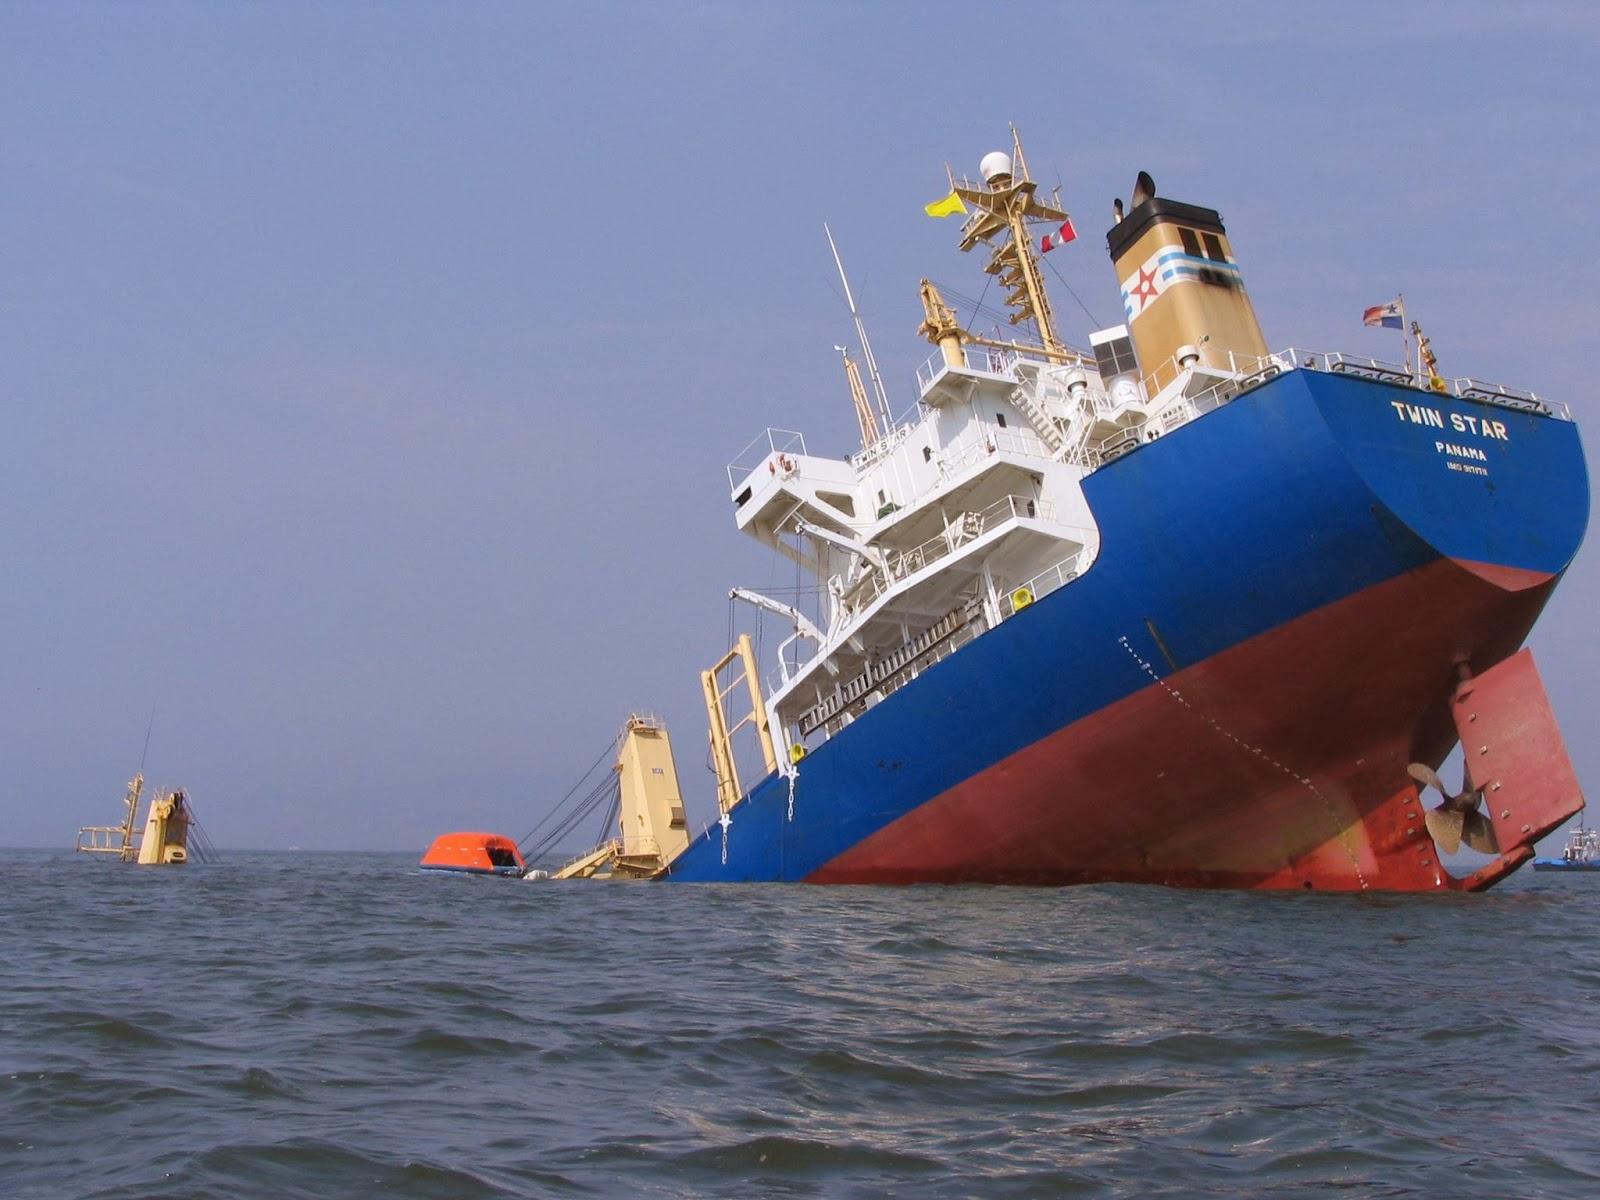 http://4.bp.blogspot.com/-Q2KljLtAlow/UwxKd8oLGhI/AAAAAAAAAyk/dGmkc1DHkVg/s1600/Titanic.jpg